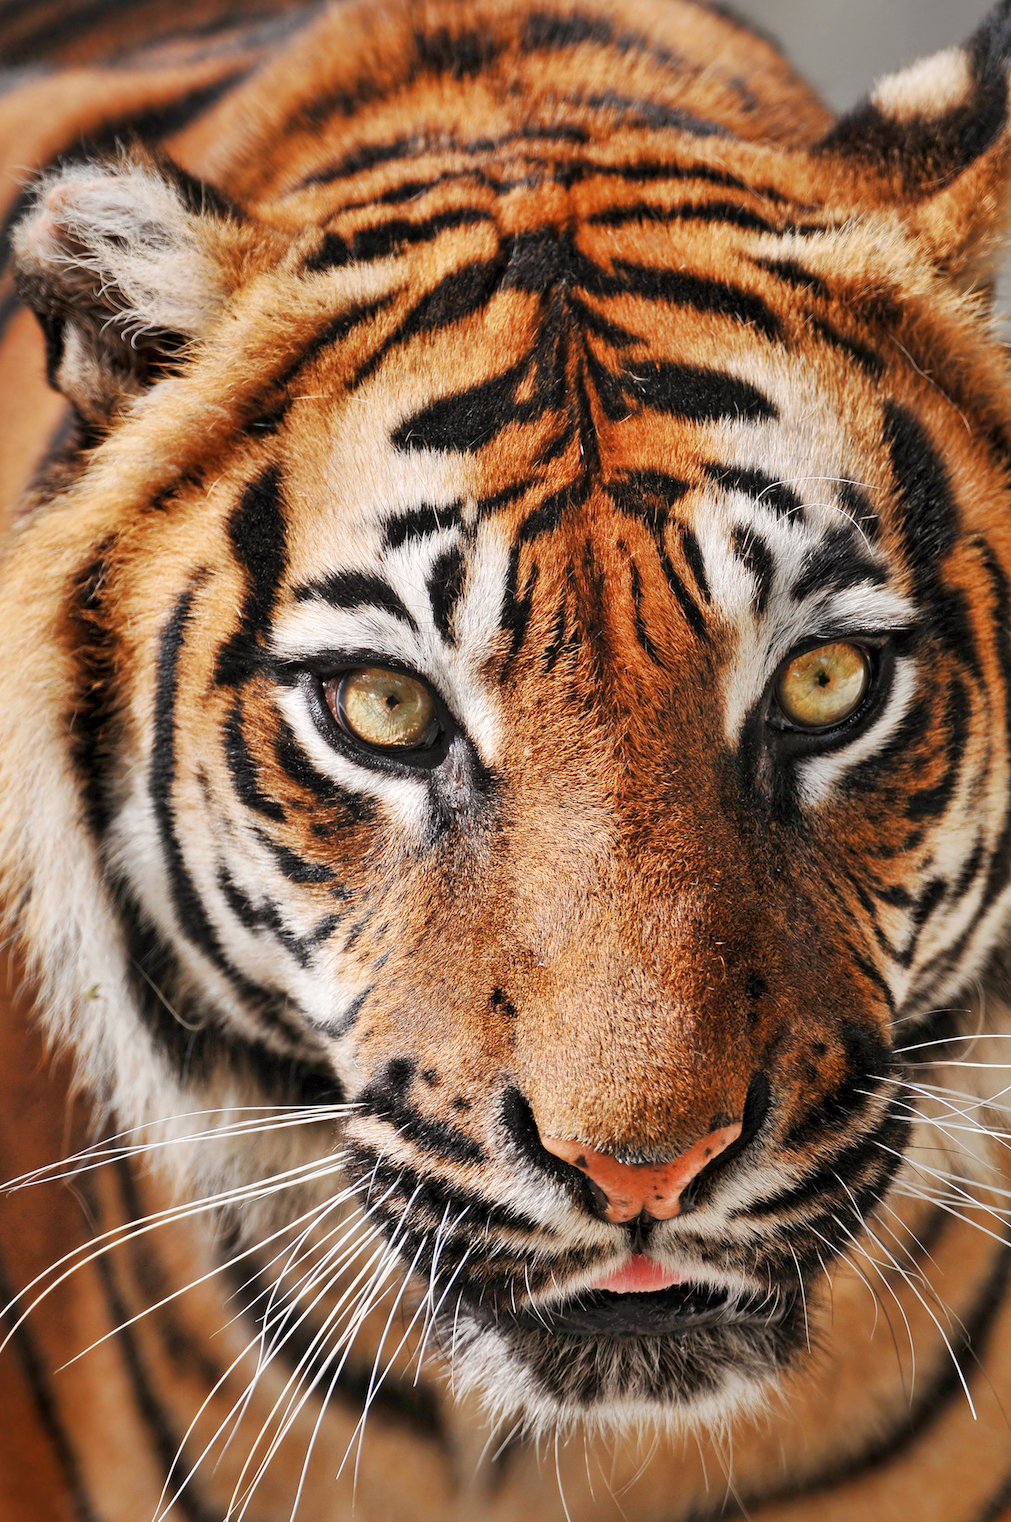 tiger headshot